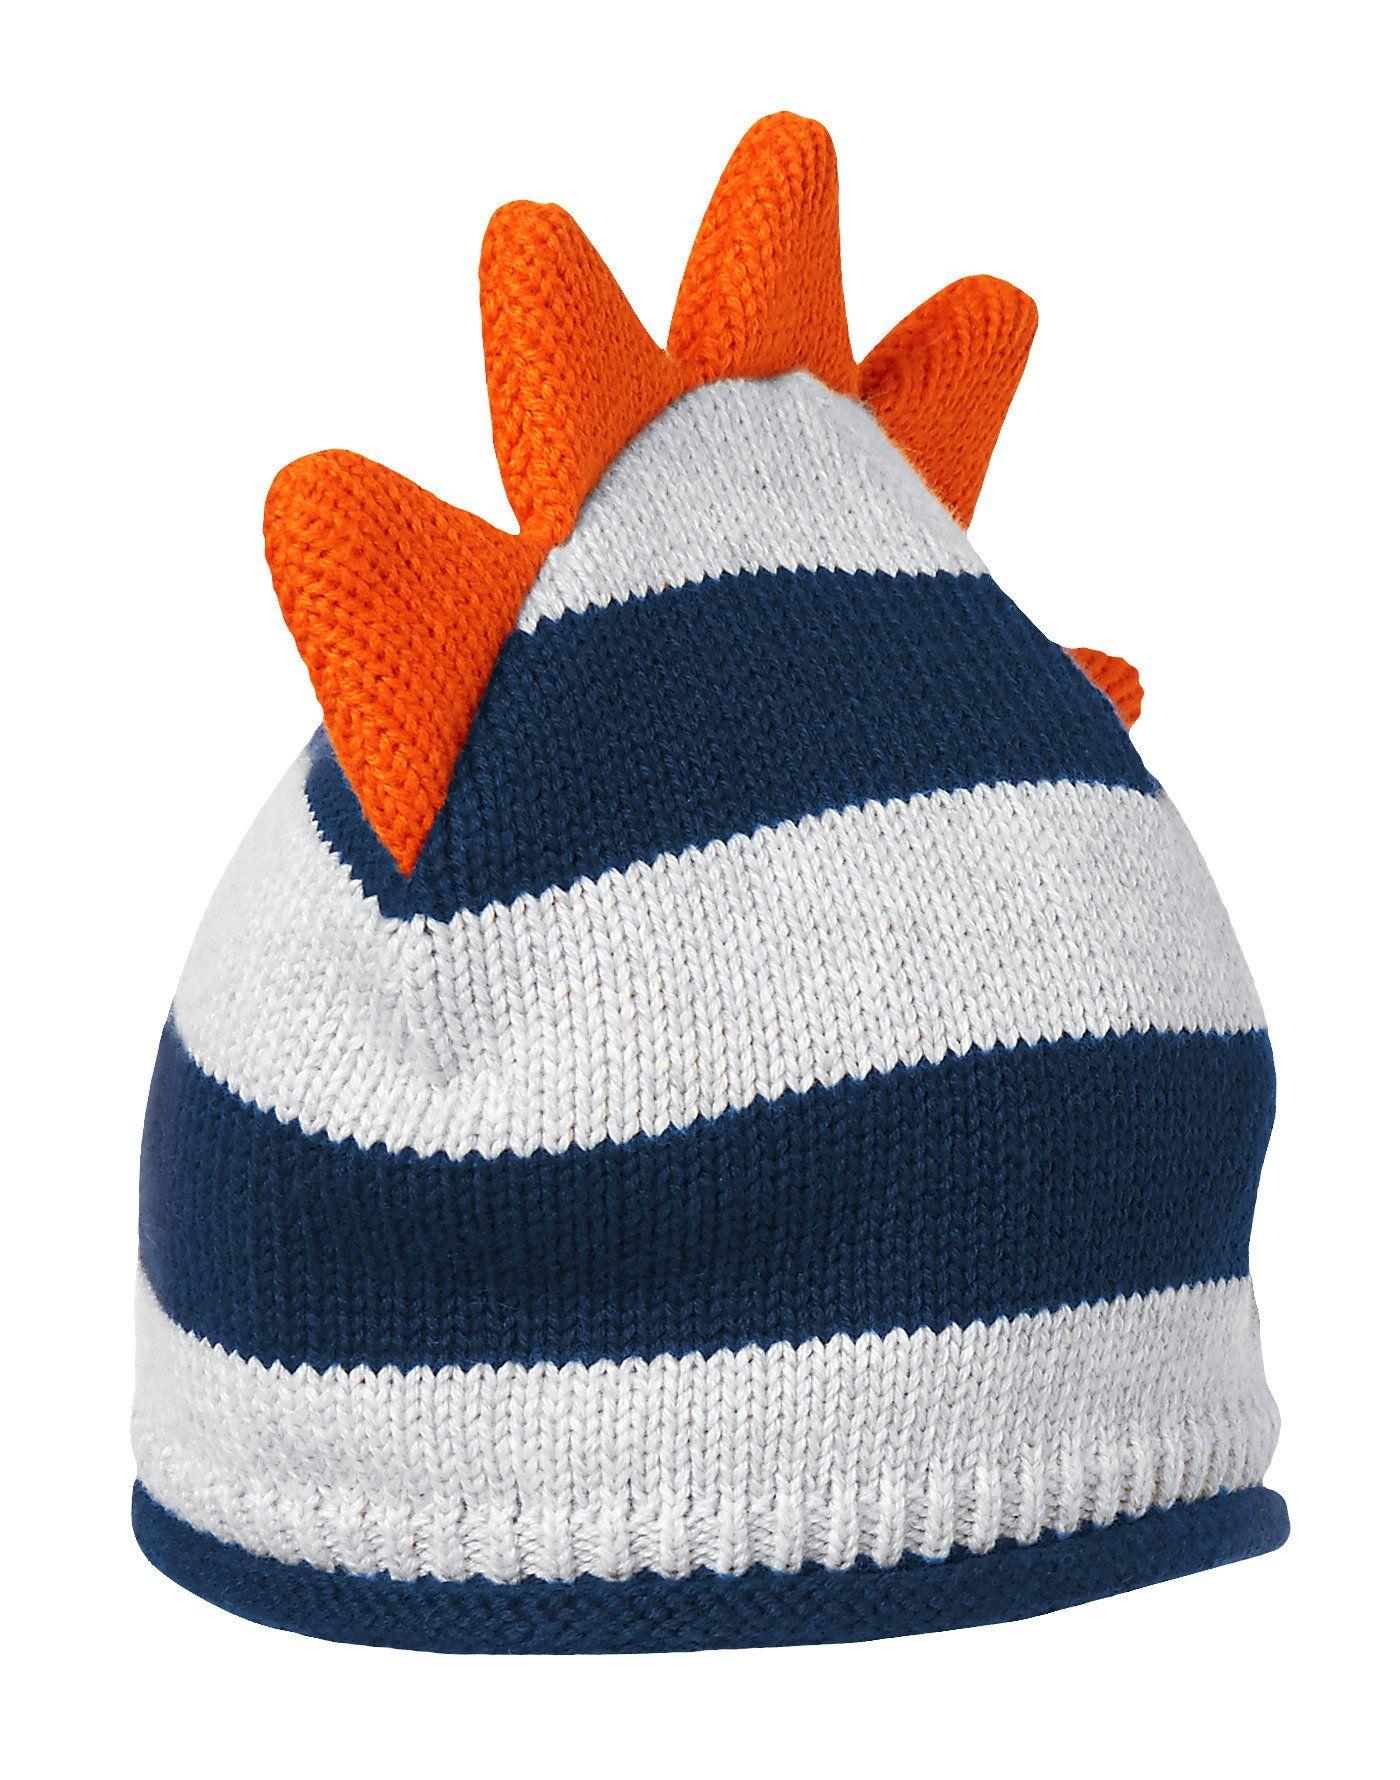 2a0de6b3366 Dino Striped Sweater Hat at Gymboree